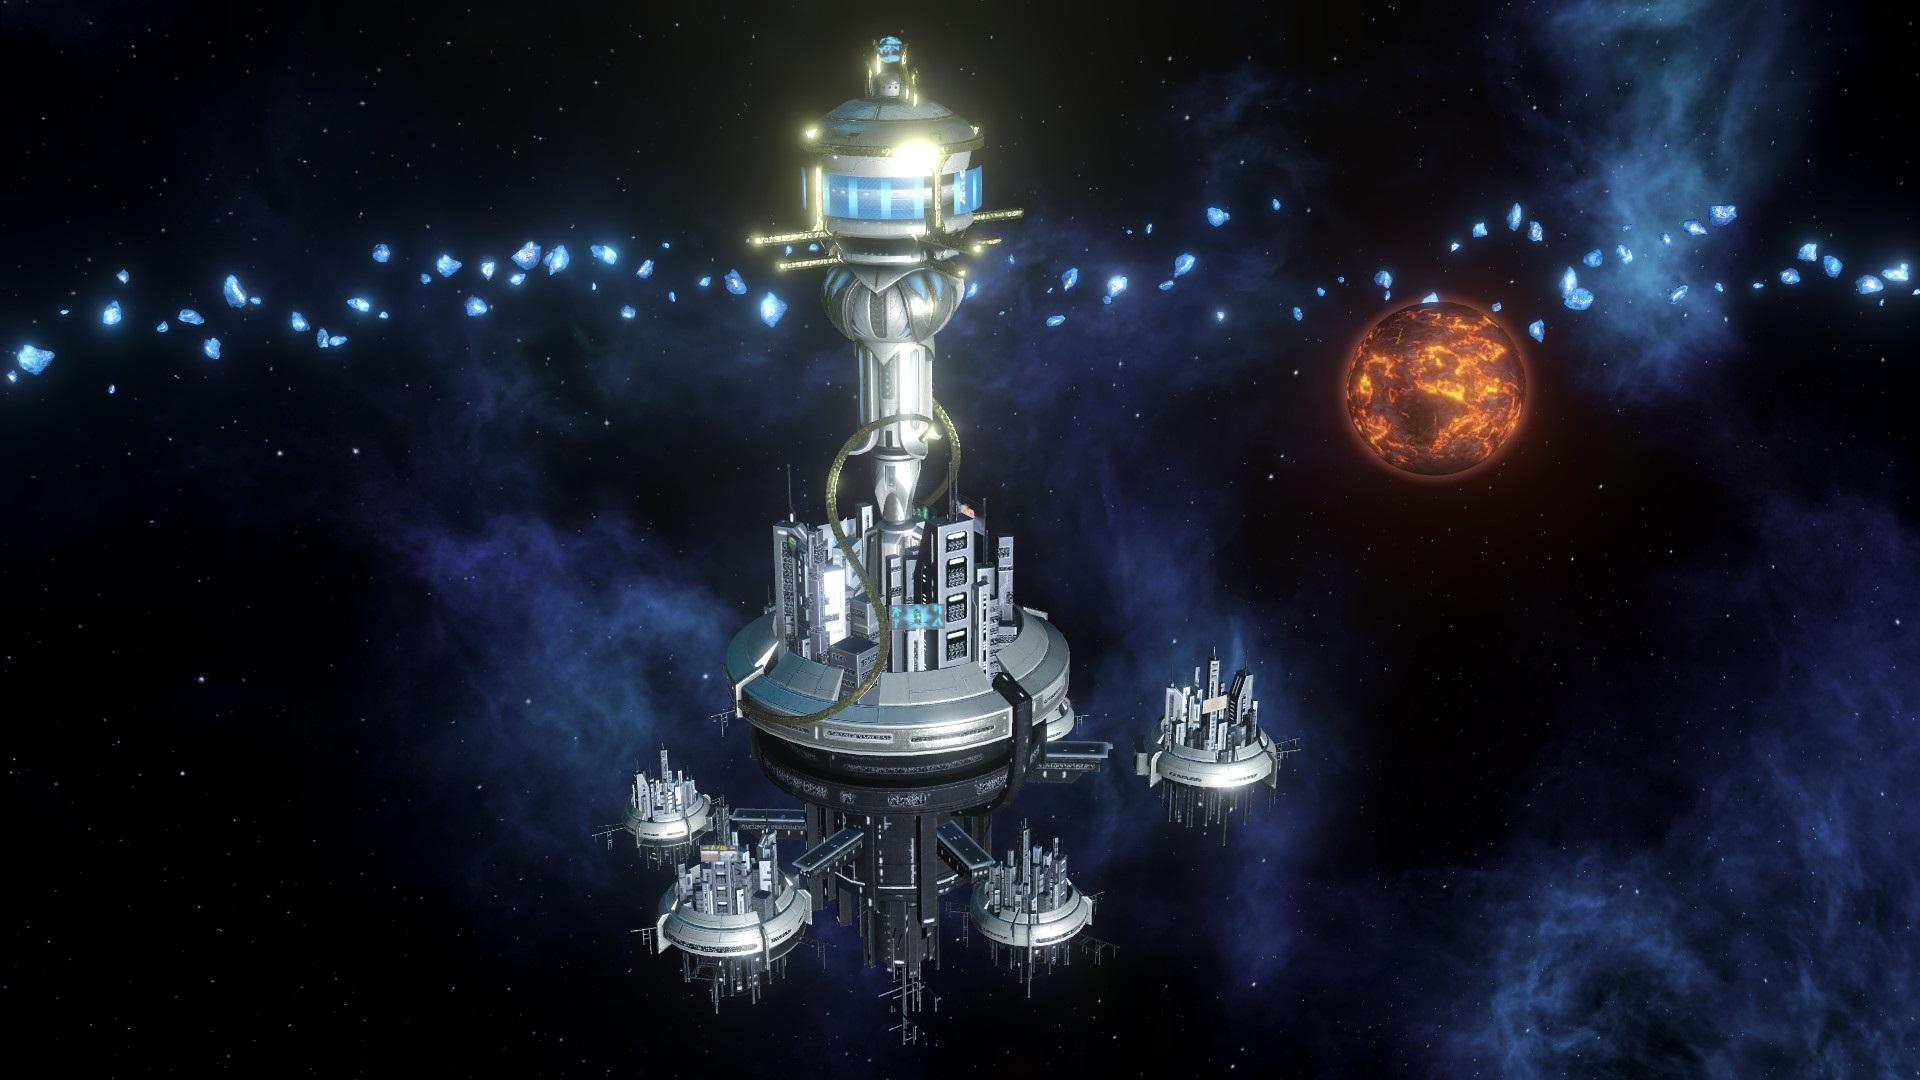 Steam销量排行榜 《群星》新DLC第1《正当防卫4》第2